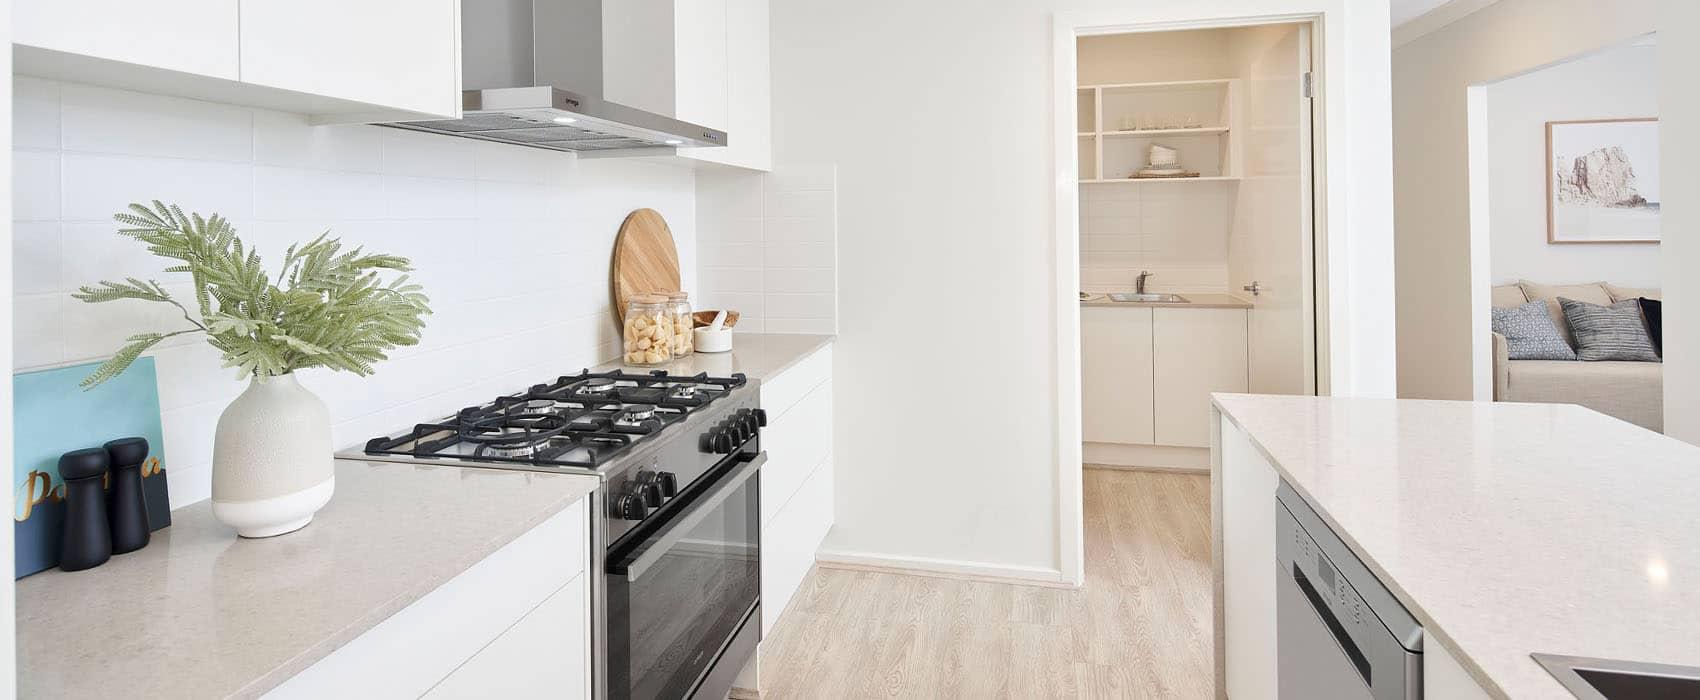 masterton-malibu29-northhampton_kitchen_02 Interior